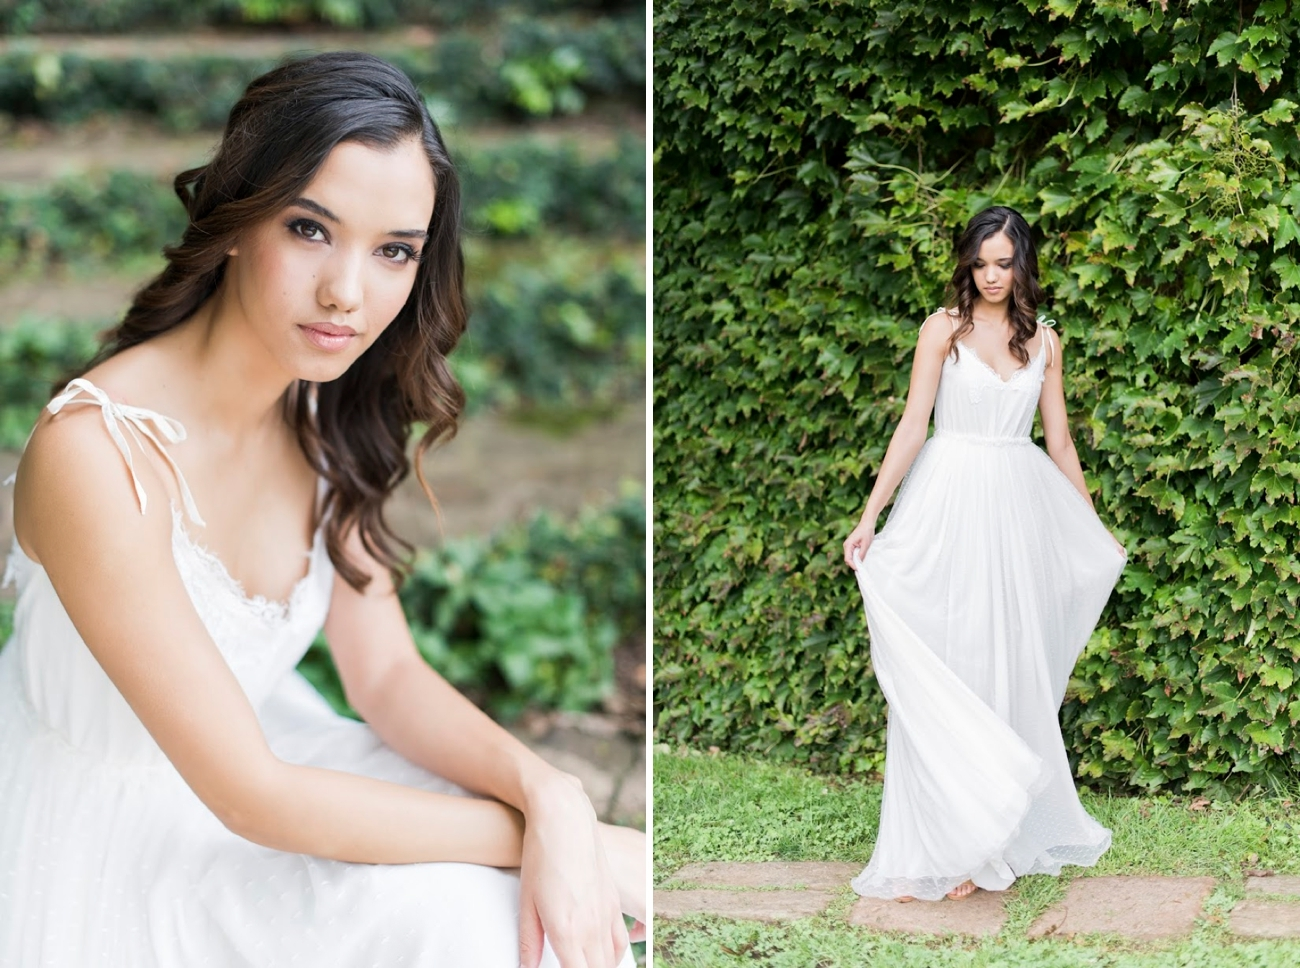 Pantone Serenity & Rose Quartz Wedding Inspiration   Credit: Jack & Jane Photography